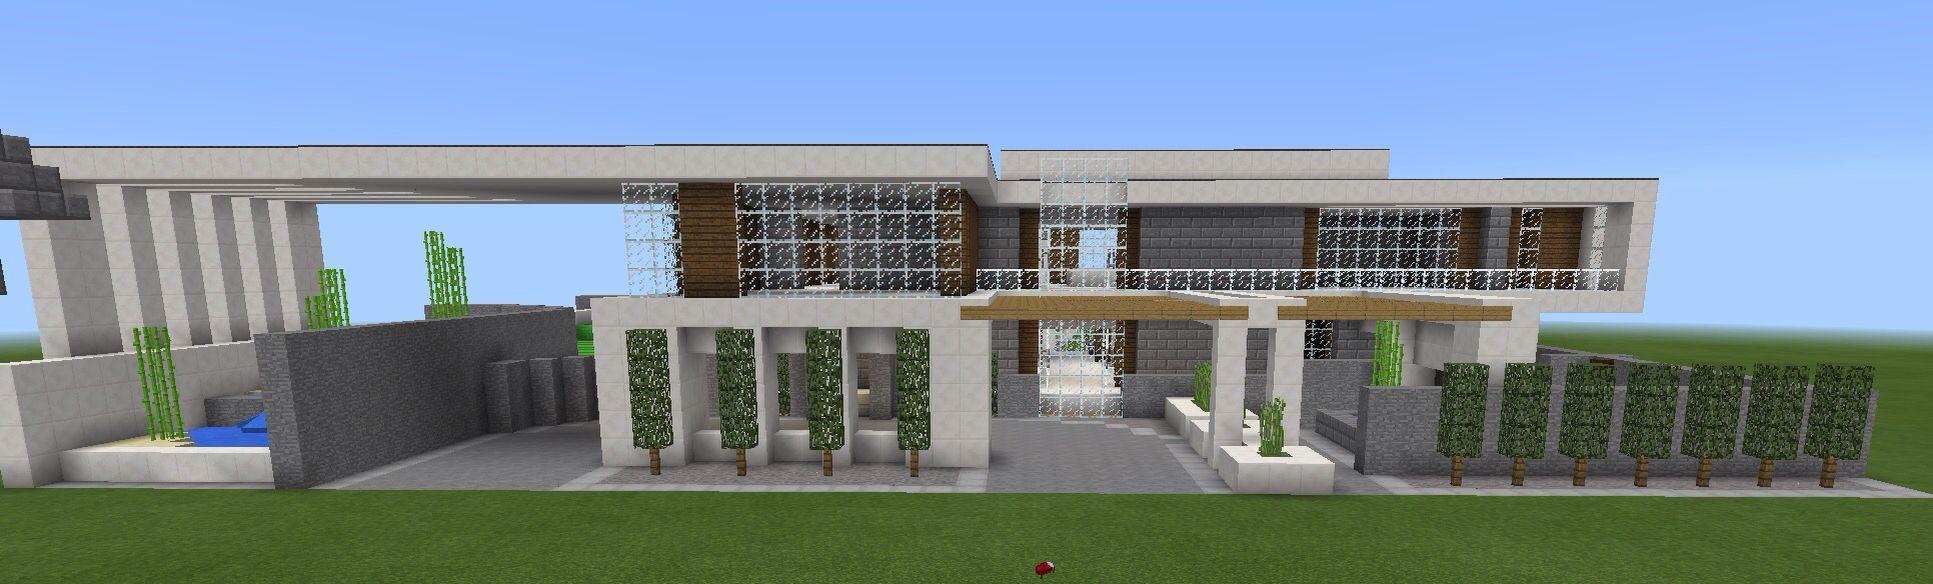 Minecraft modern house Design by keralis on YouTube Minecraft